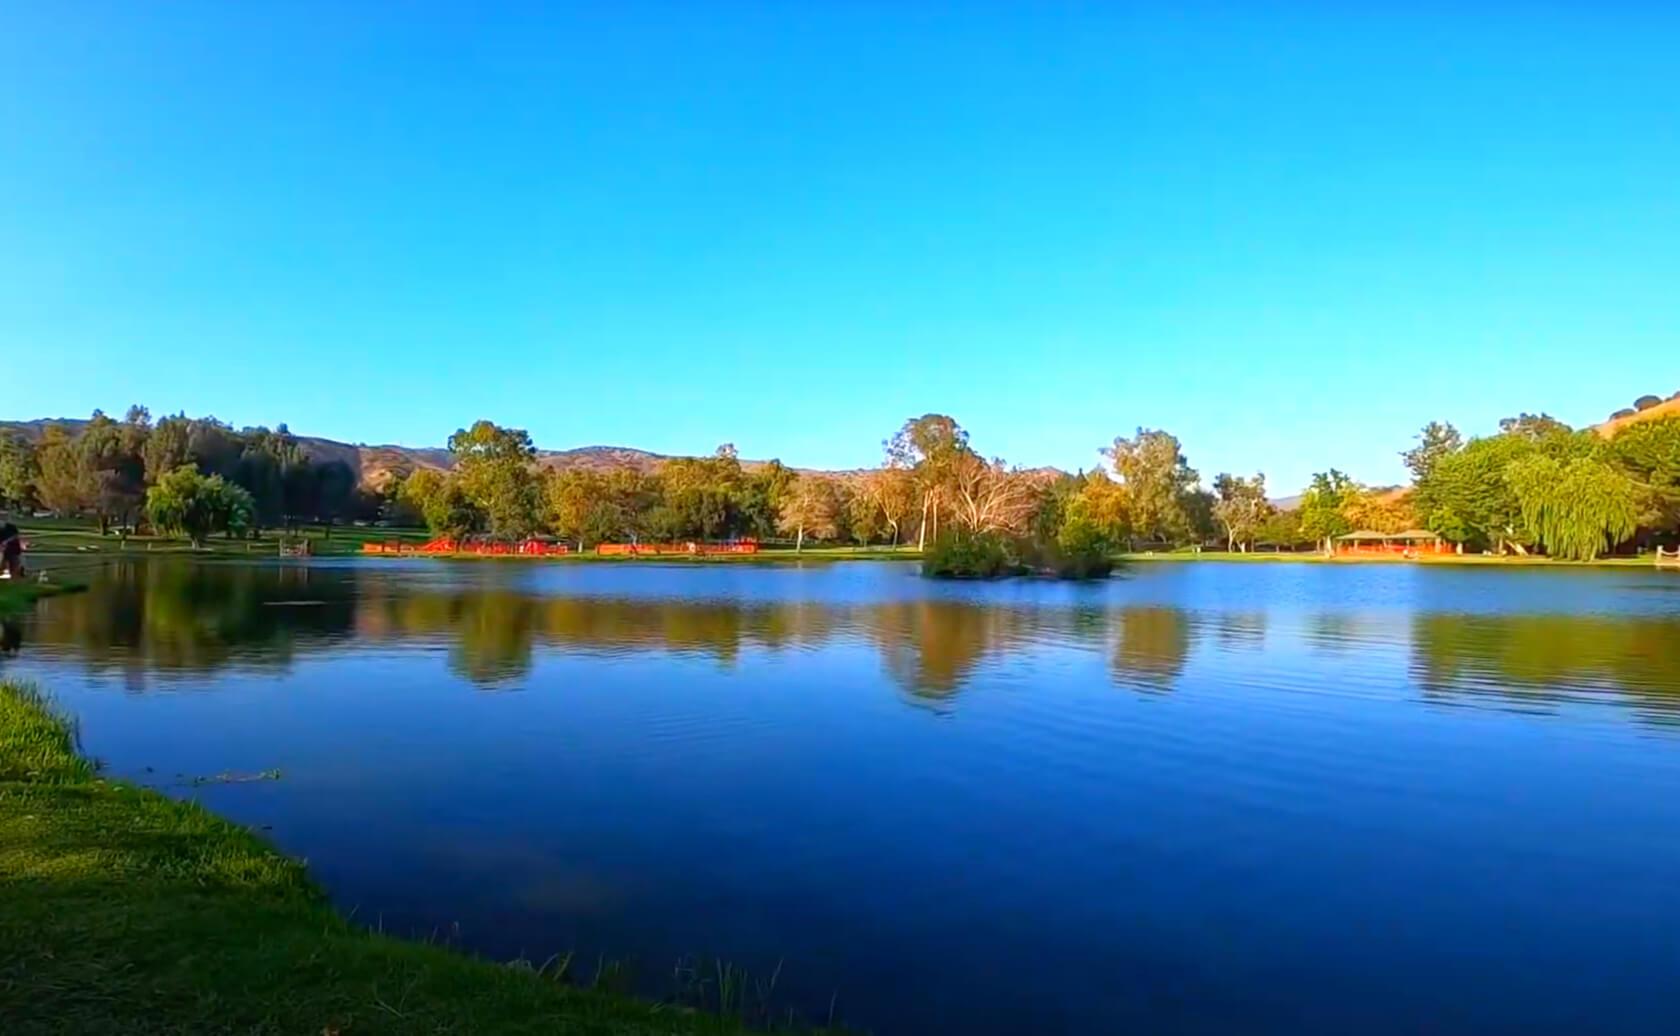 Carbon-Canyon-Park-Lake-Fishing-Guide-Report-Brea-CA-02